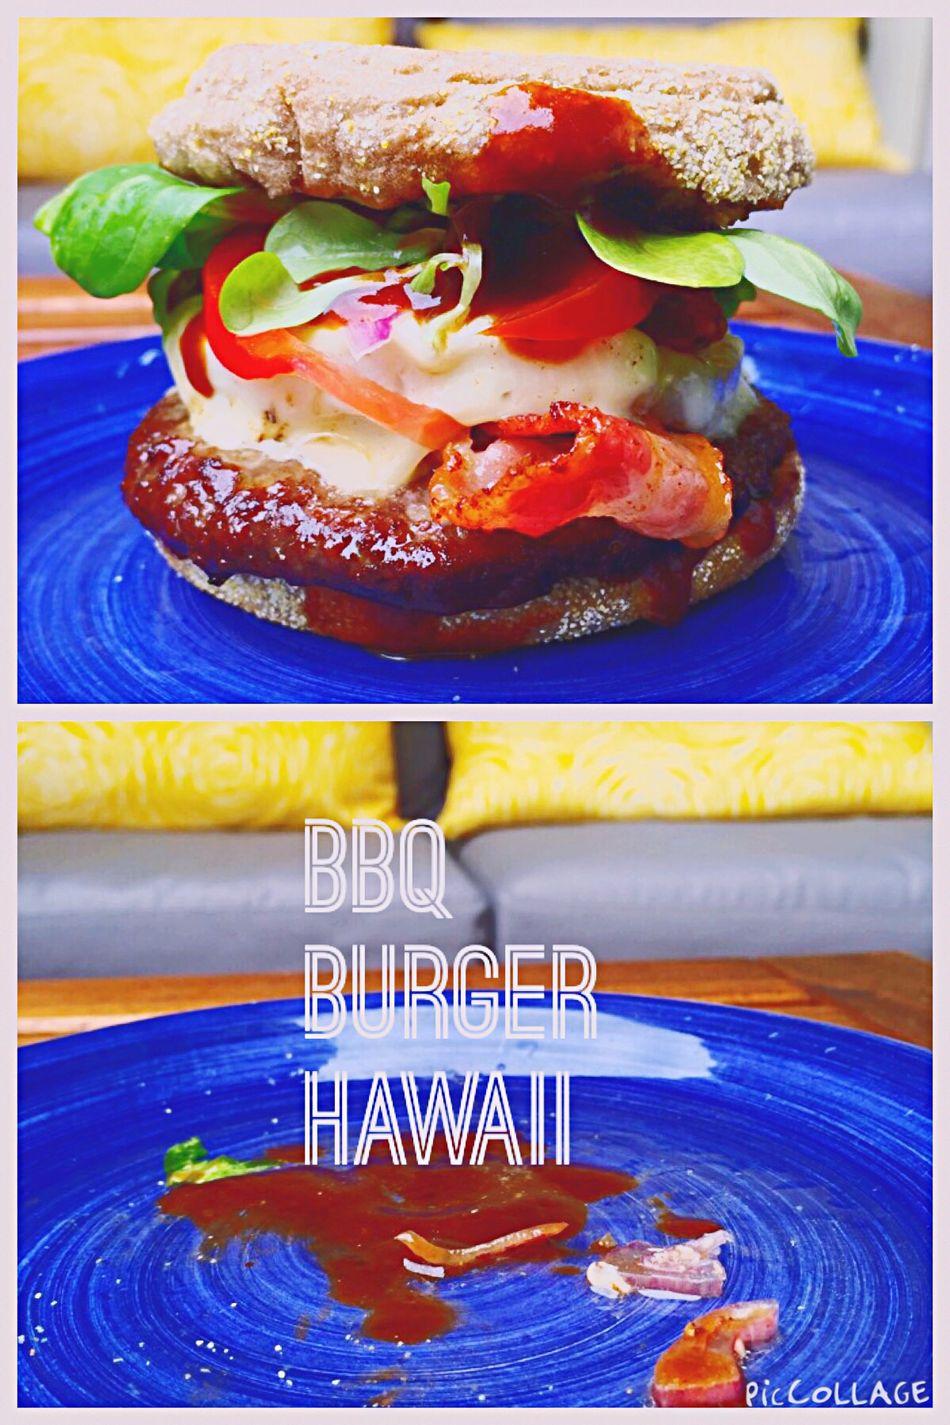 Food Porn Awards Burgers Delicious BBQ Self Made Food Foodporn